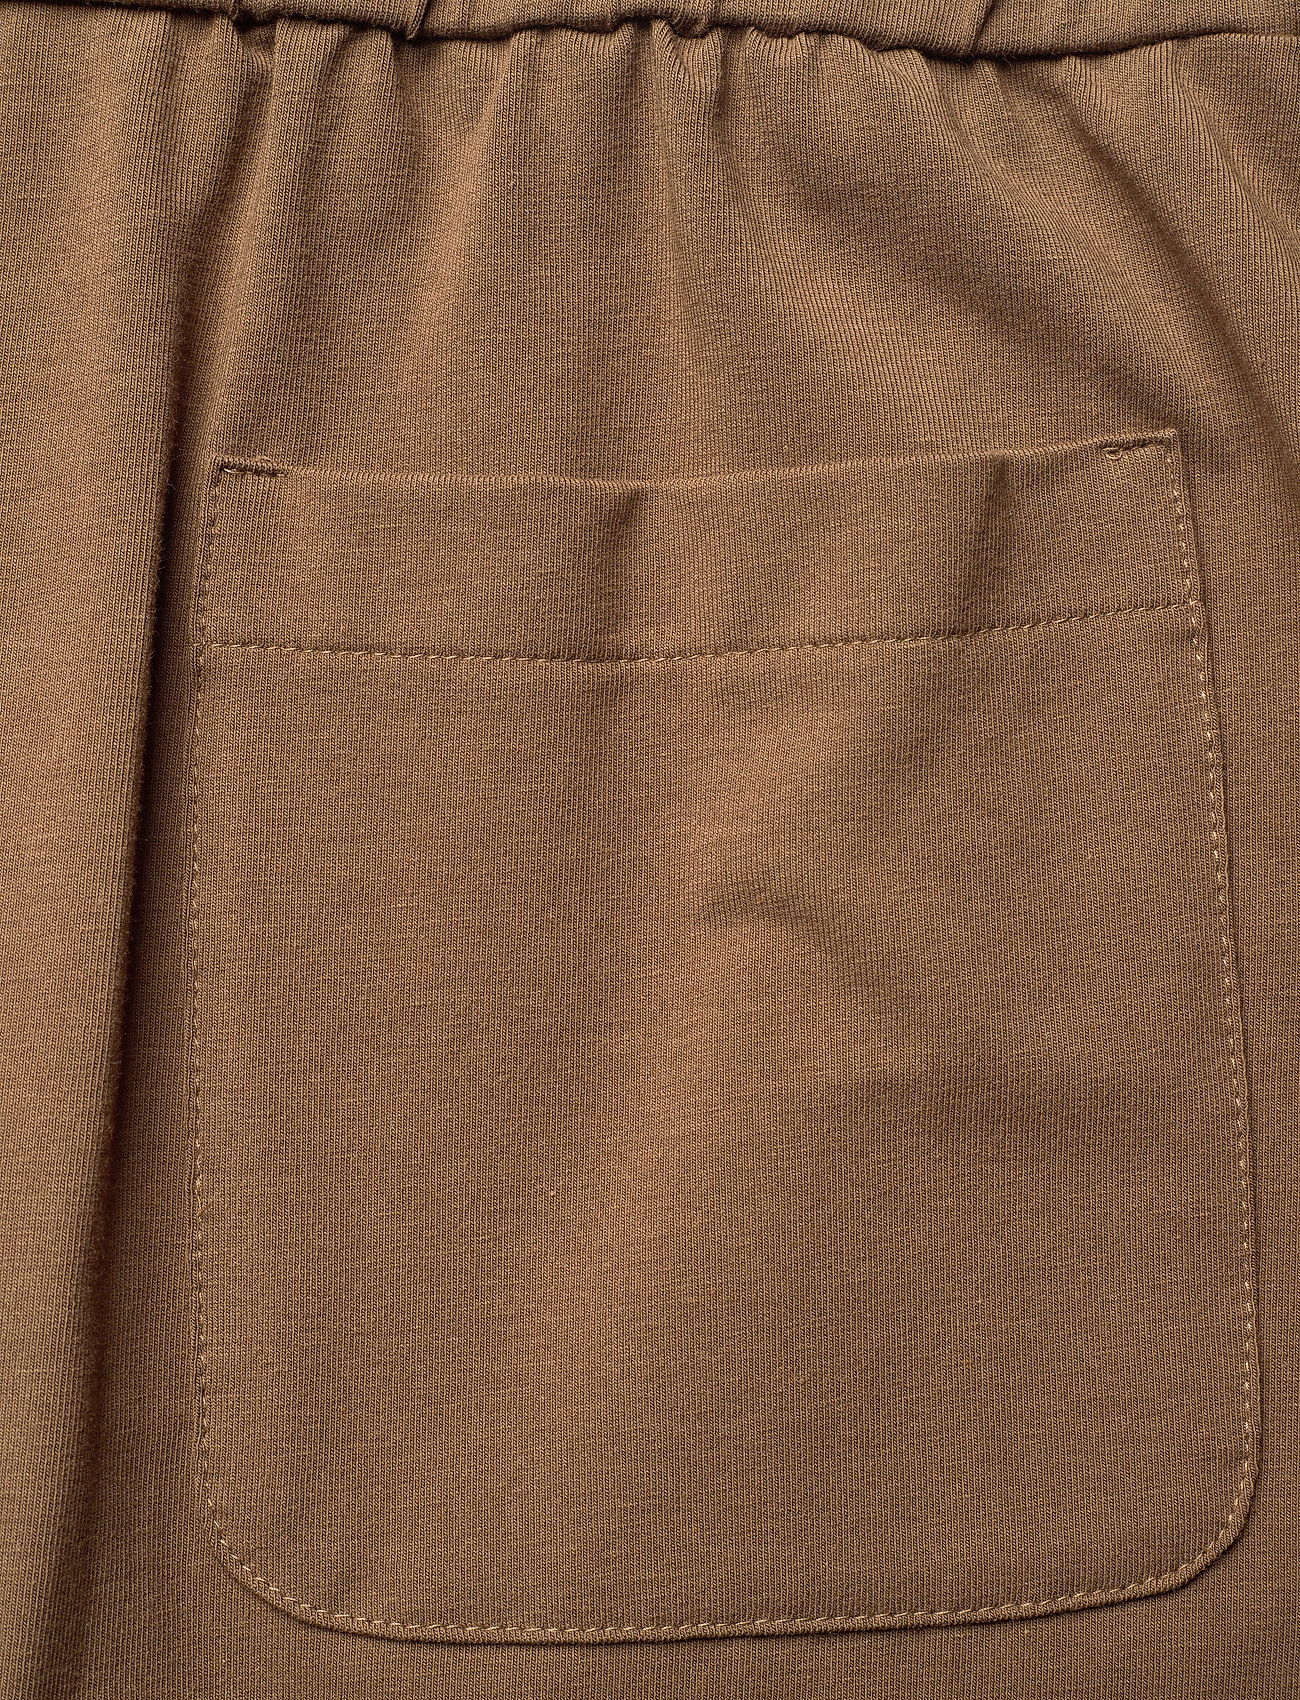 Max Mara Leisure - ELVY - midi skirts - golden green brown - 3